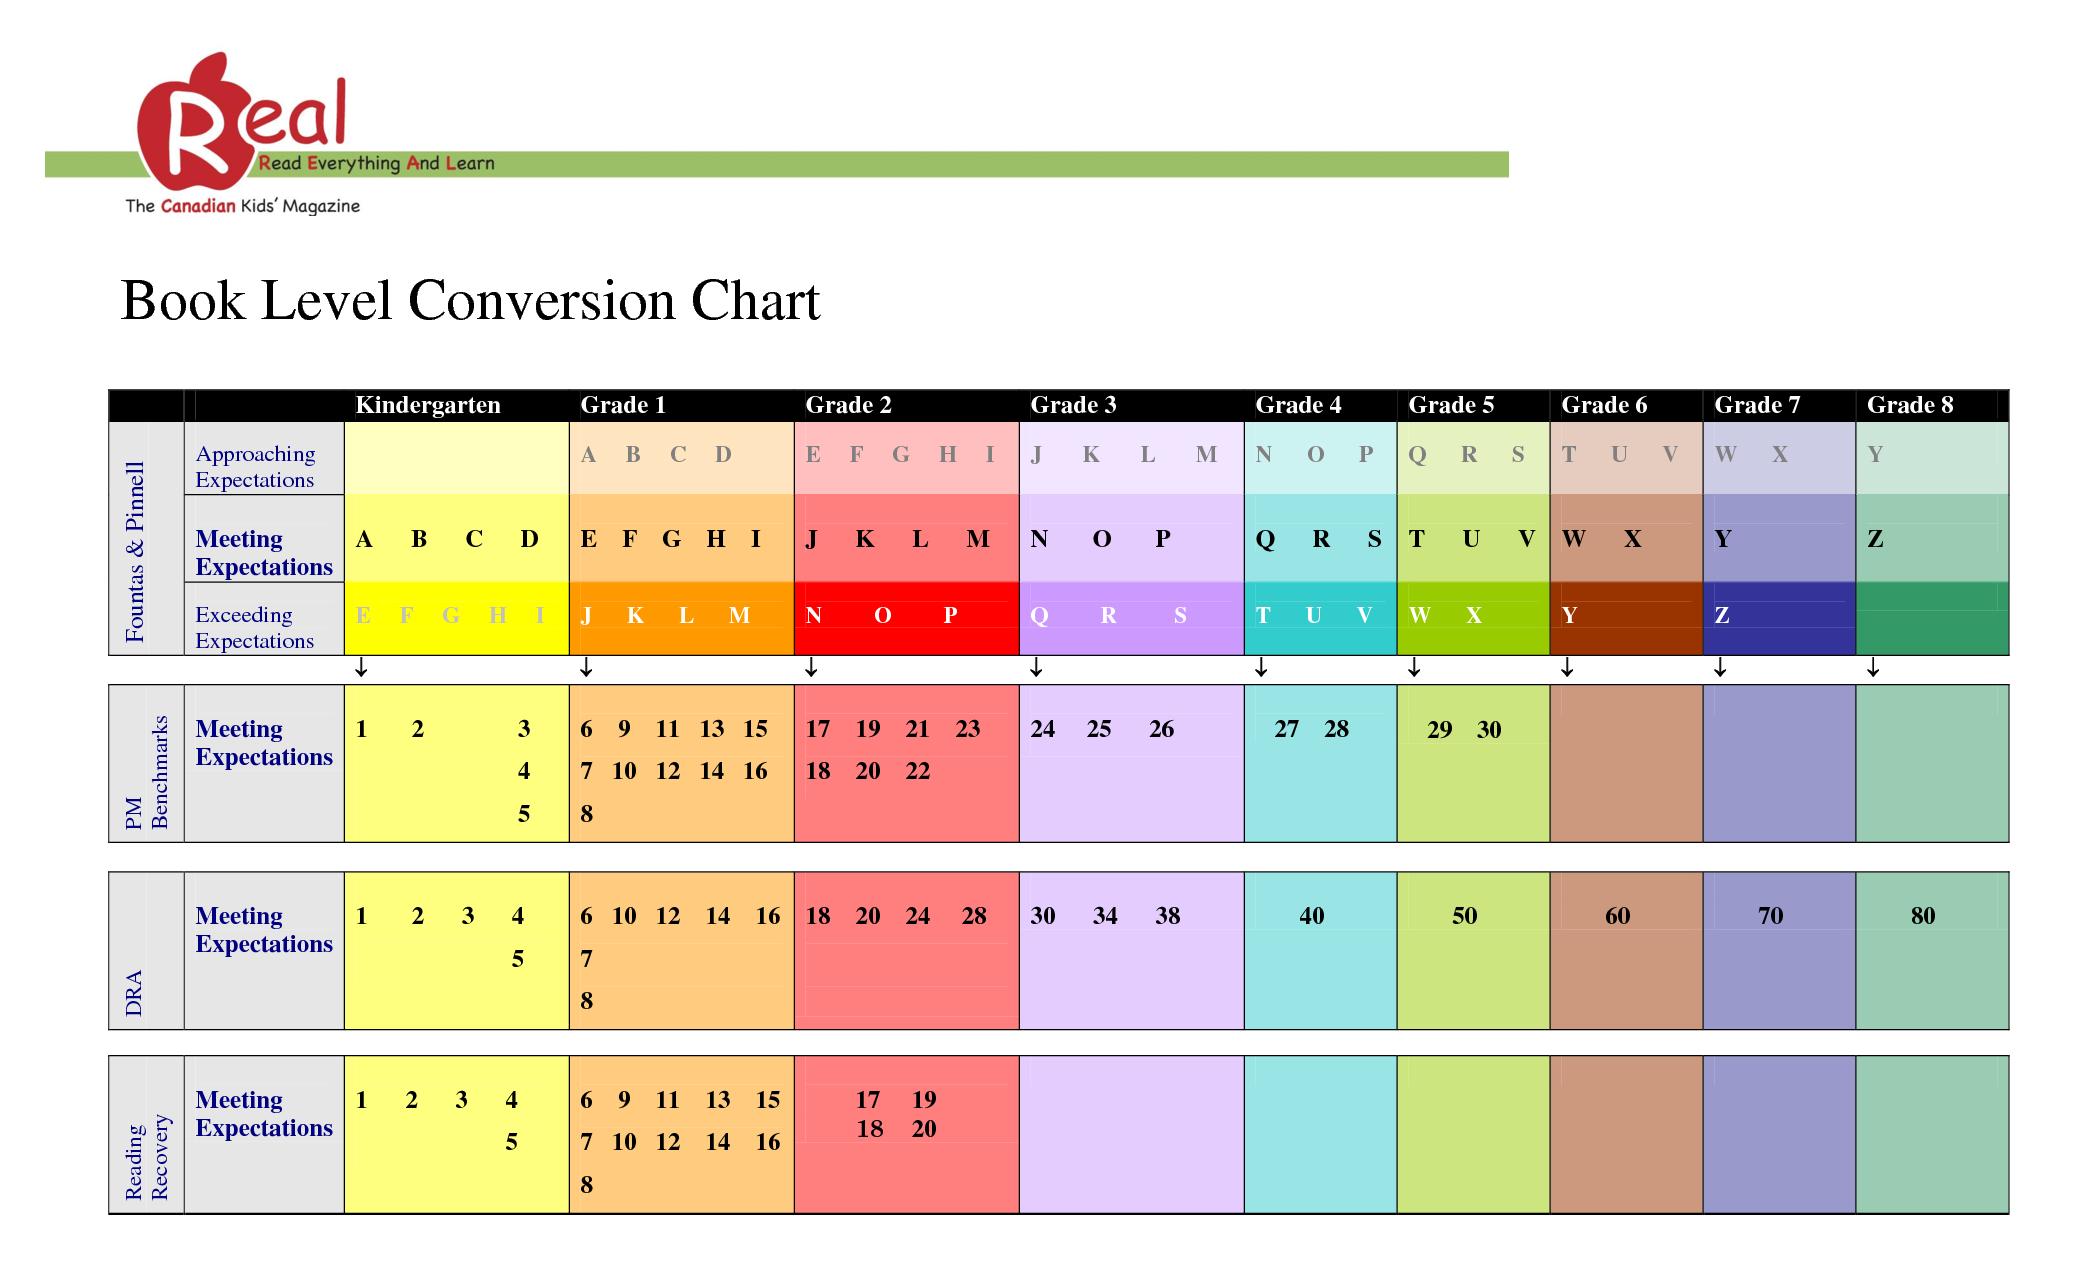 Reading Level Conversion Chart Solidique27